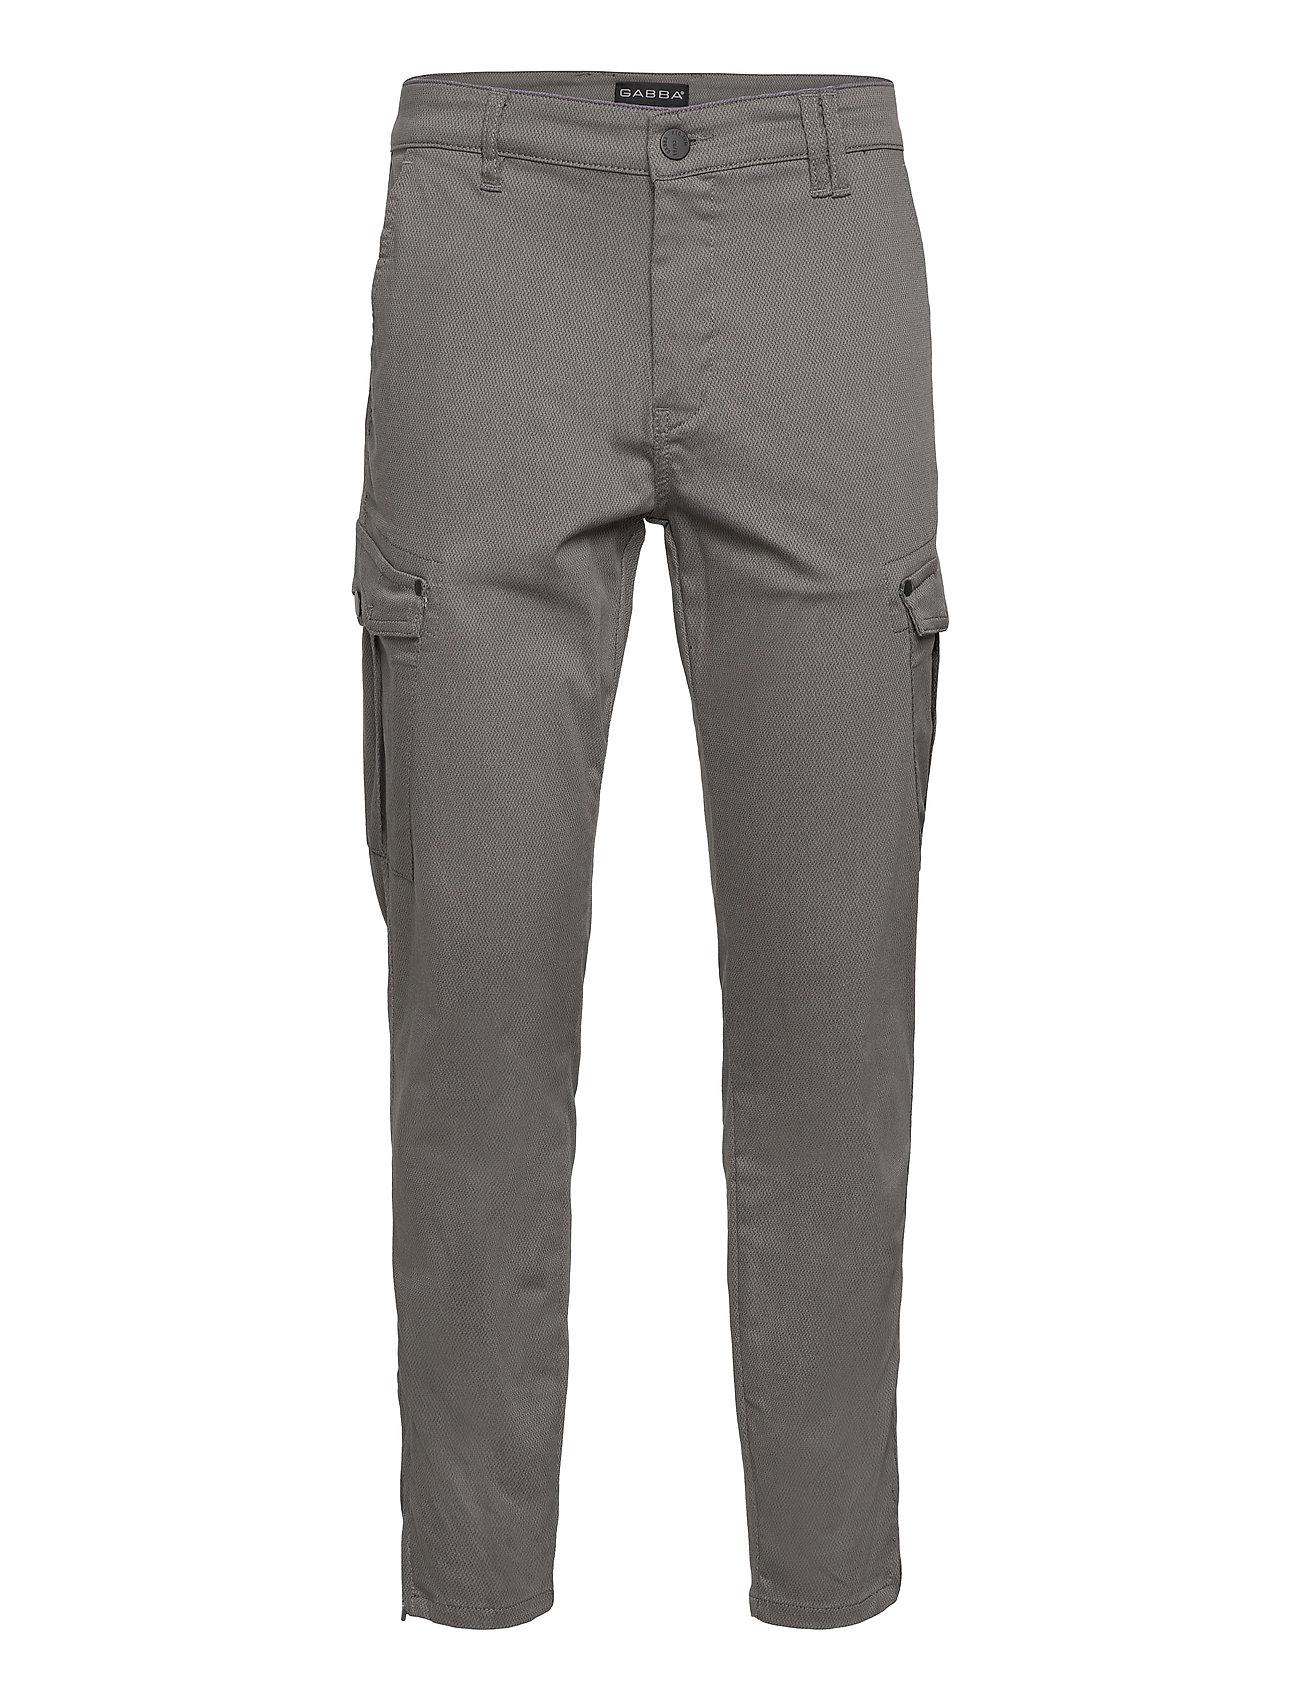 Image of Pisa Cargo K3280 Dale Pant Trousers Cargo Pants Grå Gabba (3494837951)